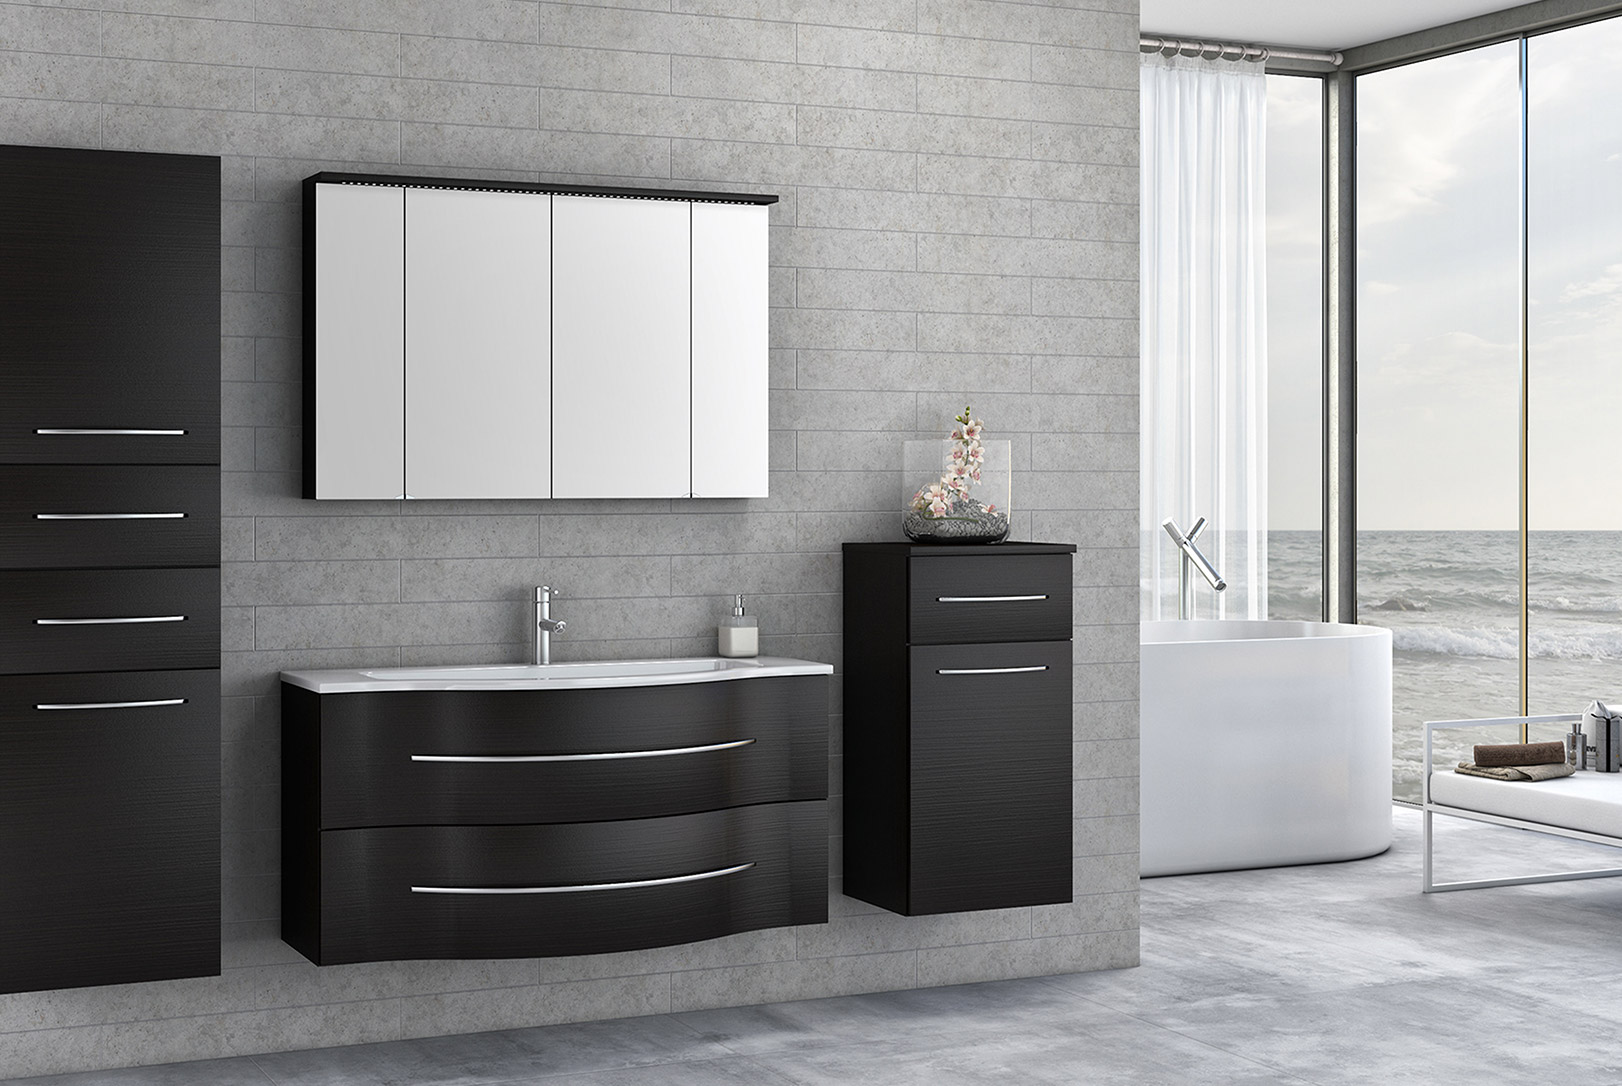 https://edilissimo.it/wp-content/uploads/2020/10/Bathroom-edilissimo-home4.jpg